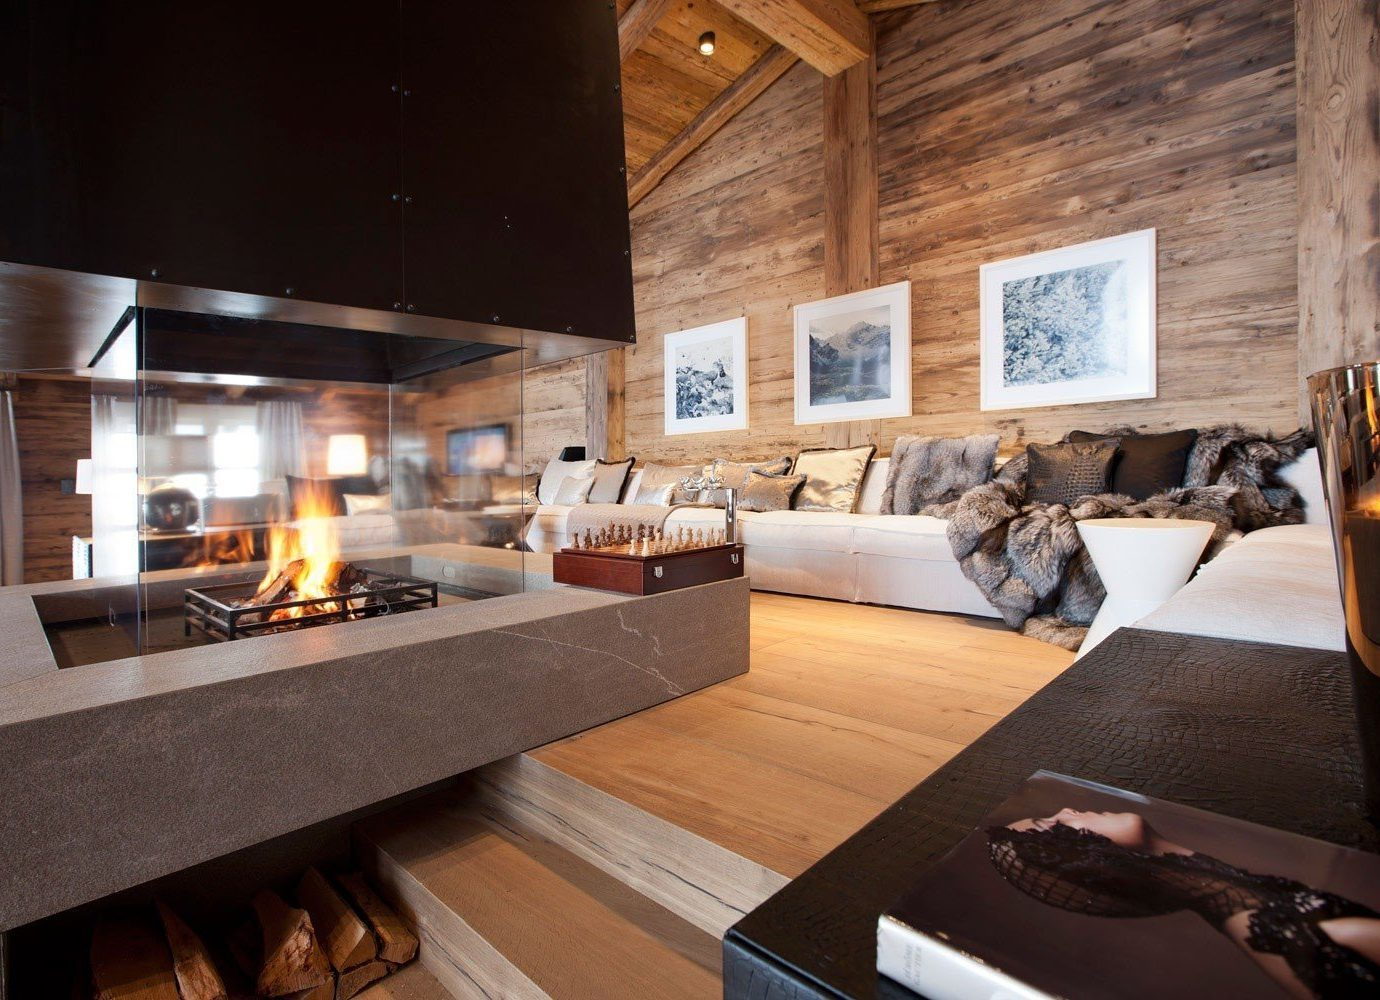 Hotels Luxury Travel Mountains + Skiing Trip Ideas indoor table Living floor room property home estate living room interior design hardwood wood Design hearth wood flooring furniture Modern